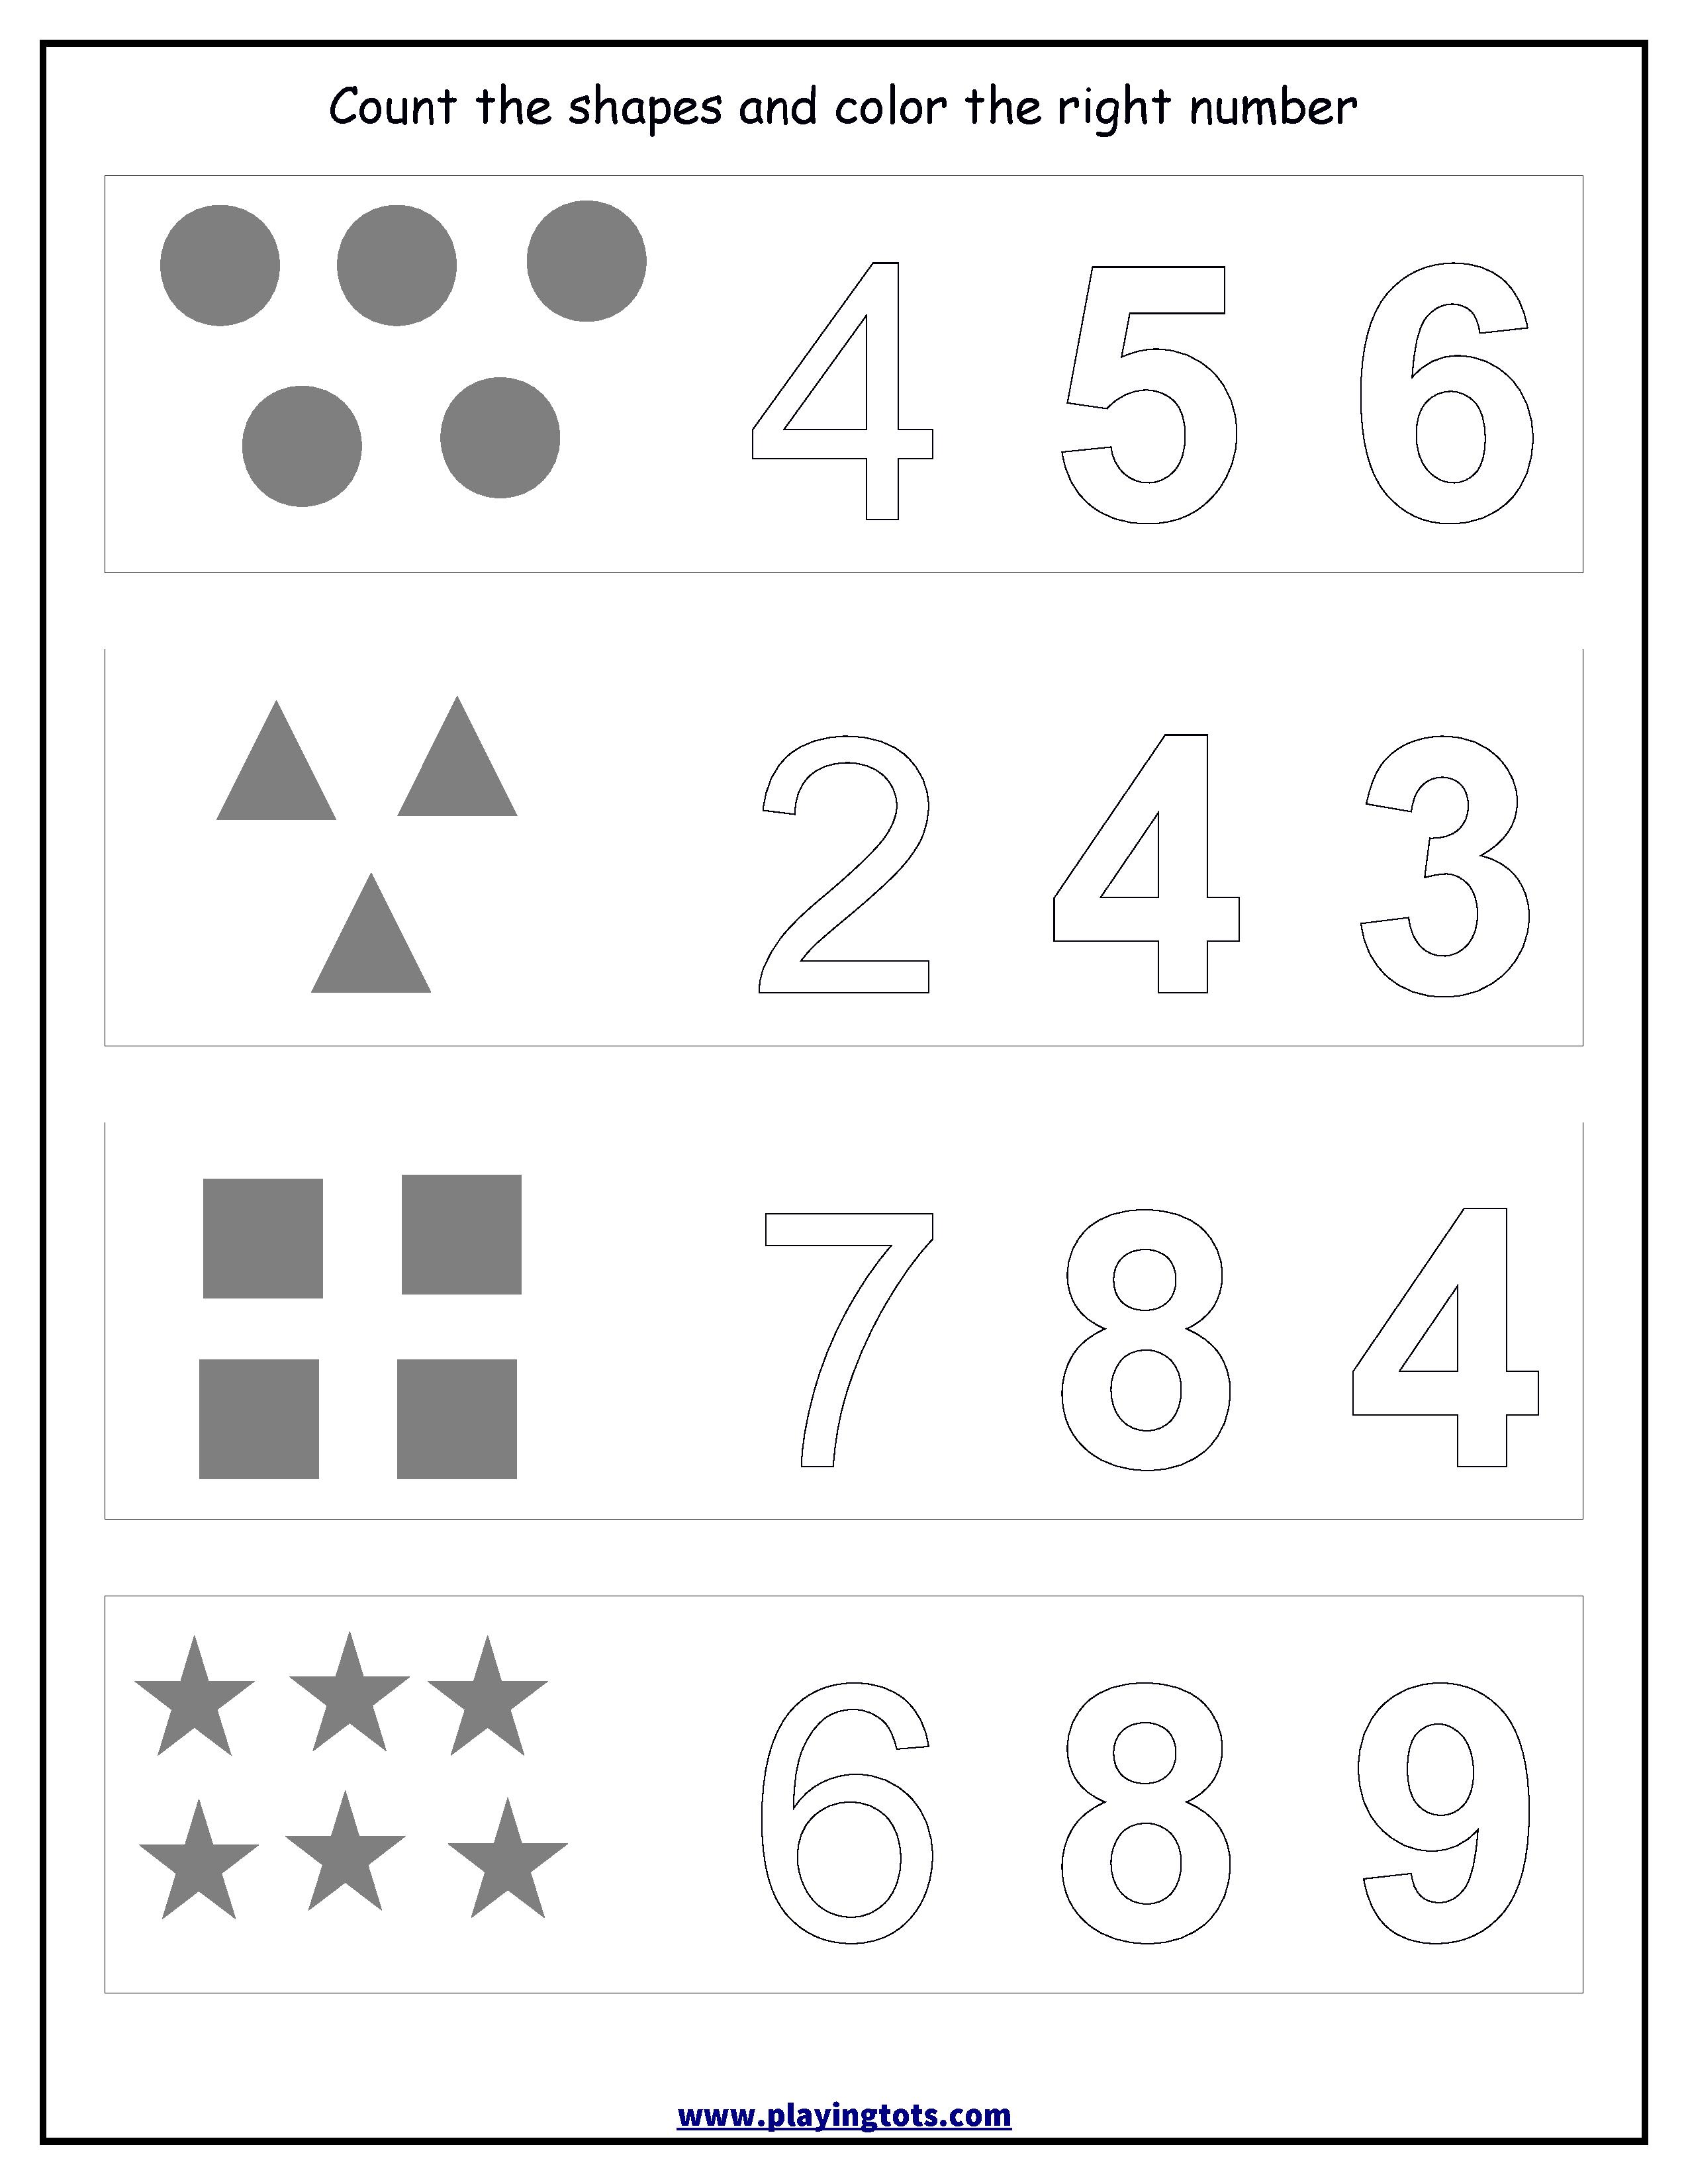 Worksheet - Counting Shapes,coloring Numbers Keywords:free - Free Printable Activities For Preschoolers